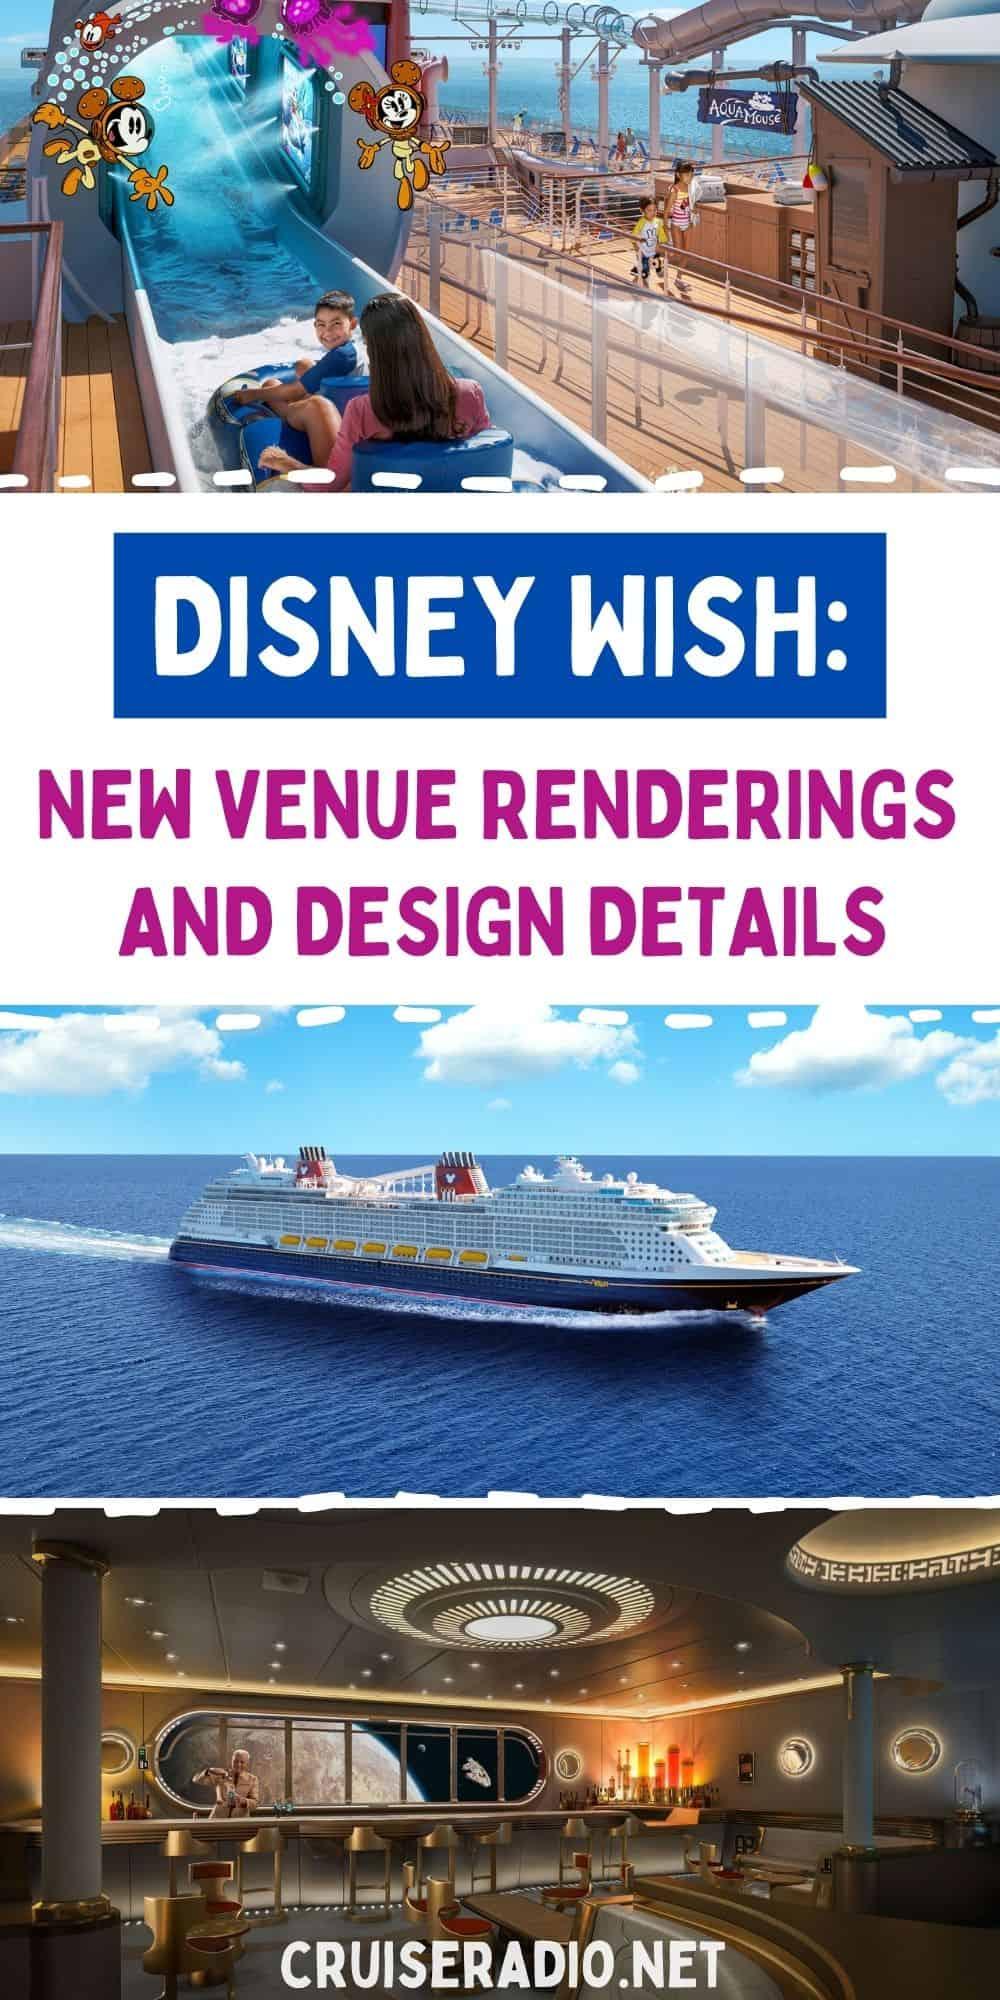 disney wish: new venue renderings and design details